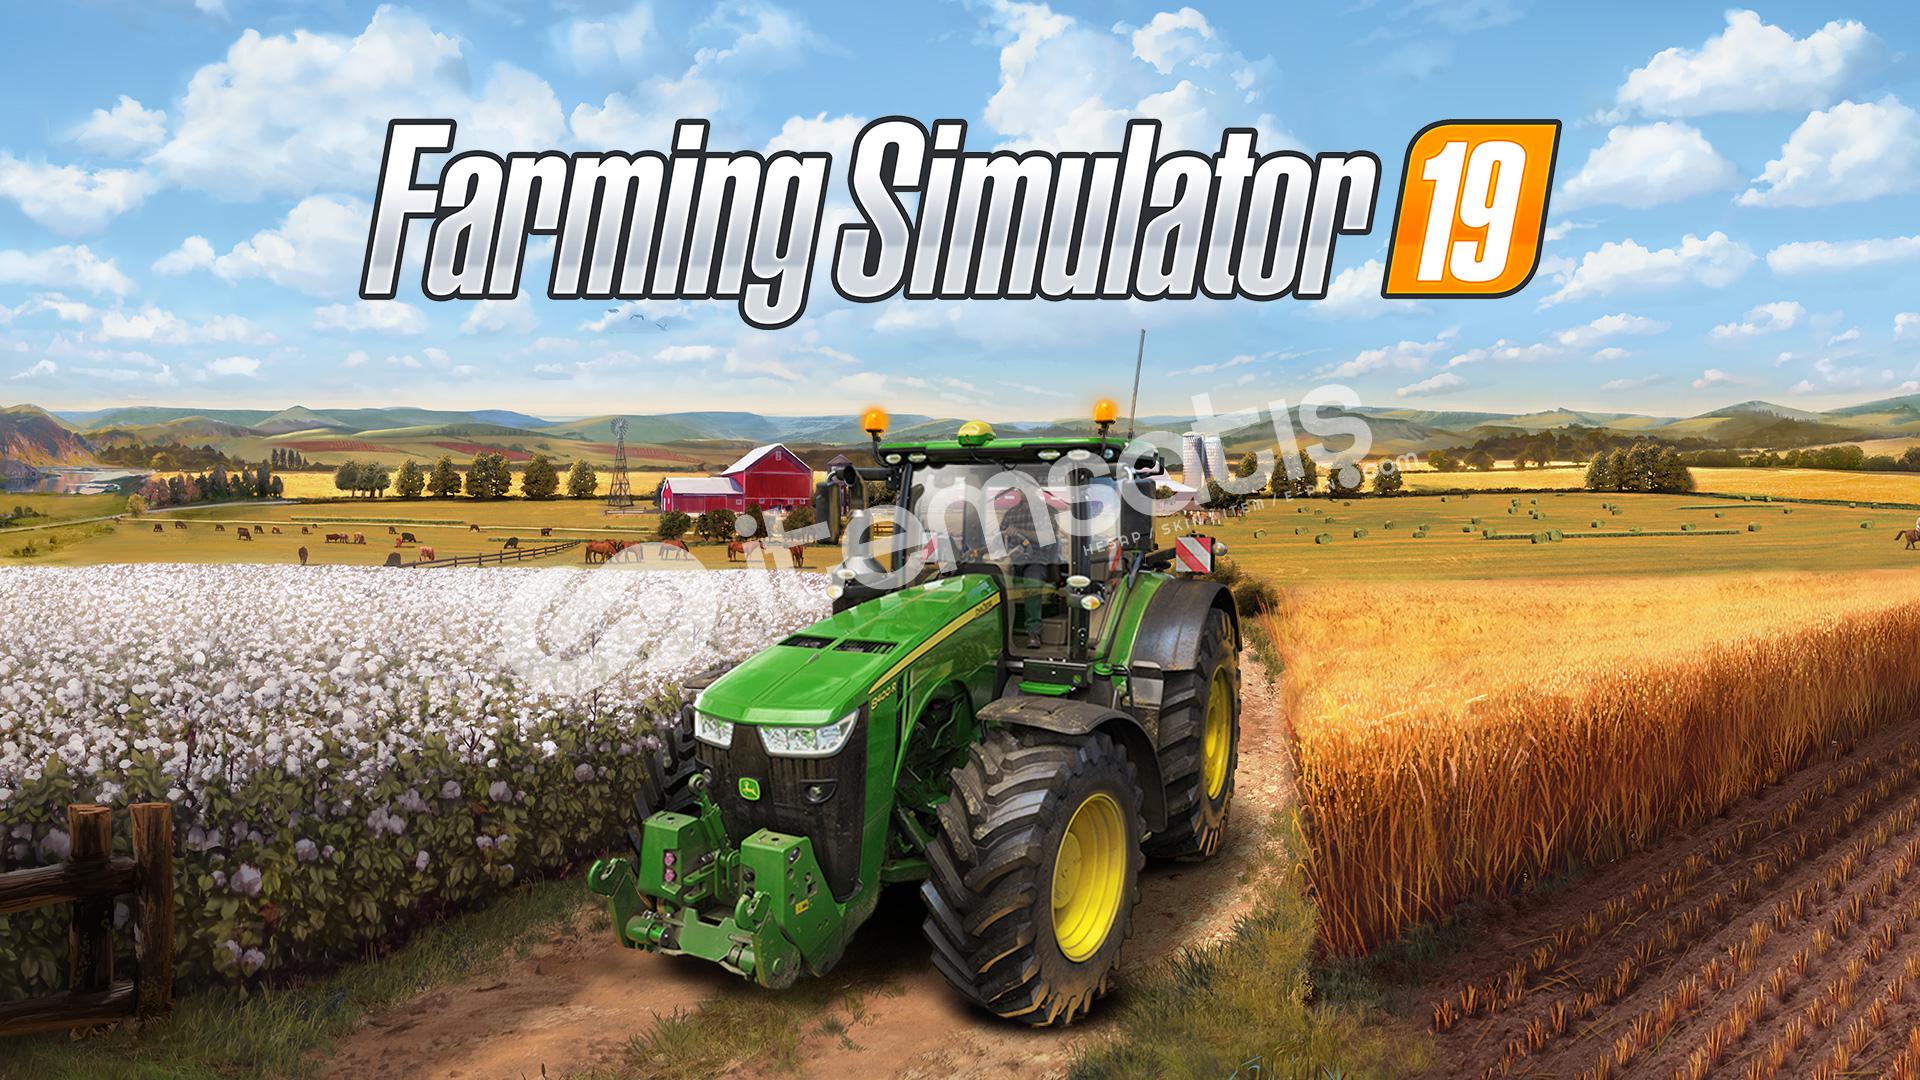 Farming Simulator 19 (6.99TL)